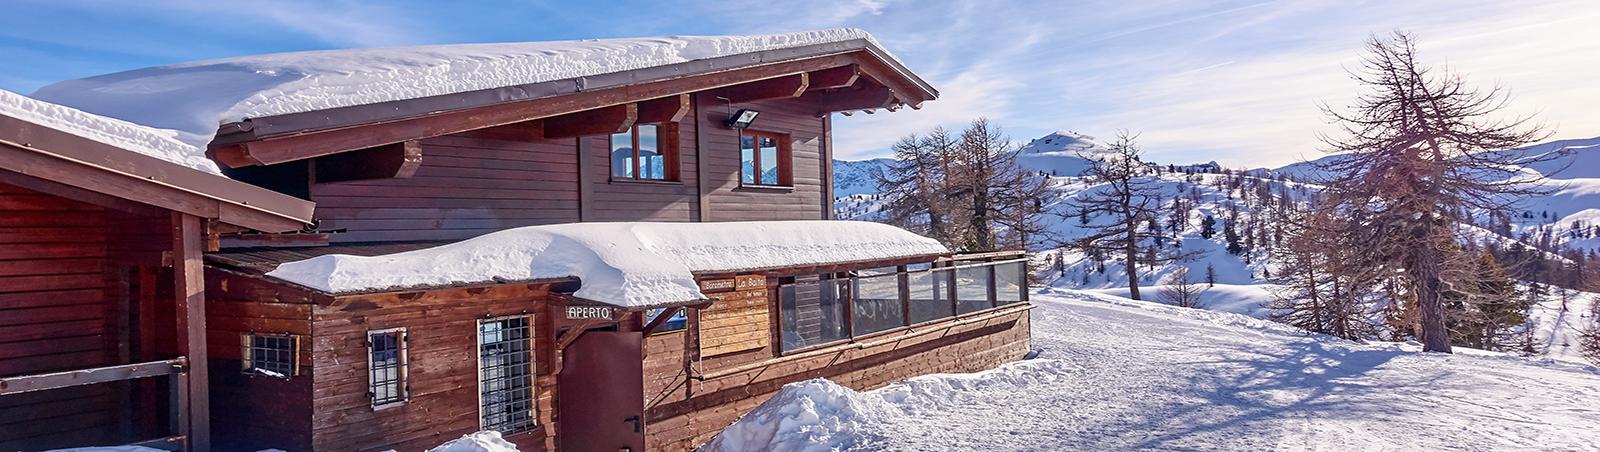 Cesana Torinese School Ski Trips